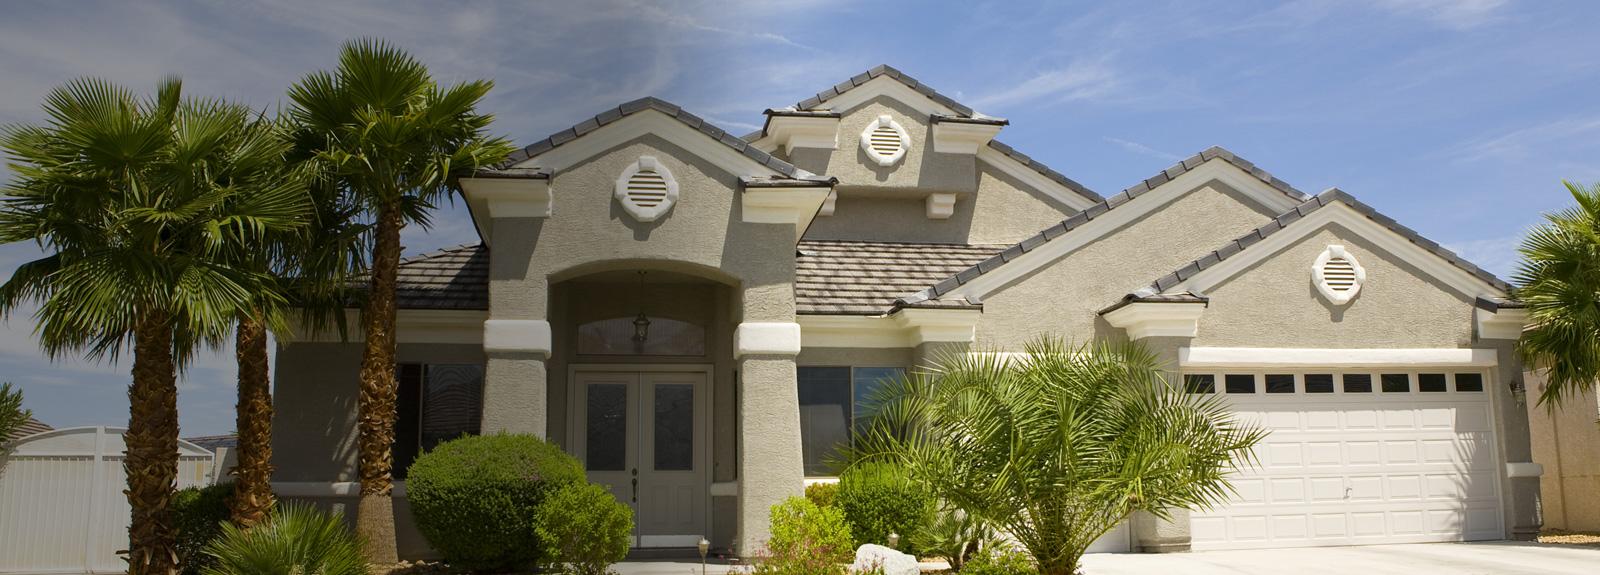 Nevada home warranty companies